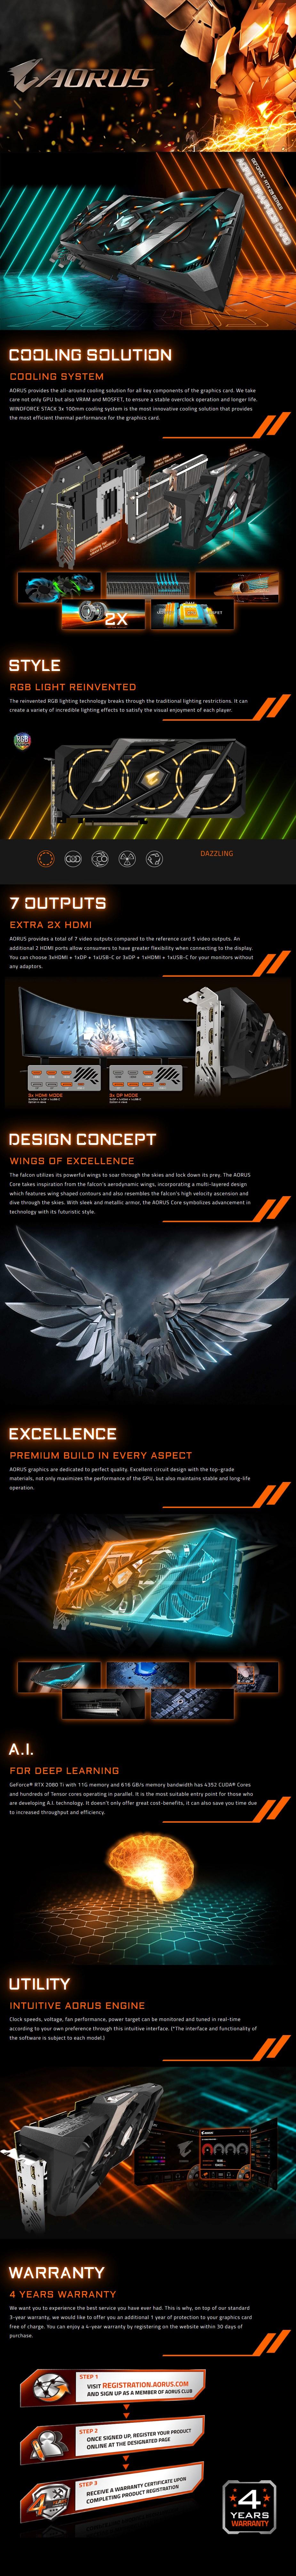 Gigabyte AORUS GeForce RTX 2080 Ti 11GB Video Card - Desktop Overview 1